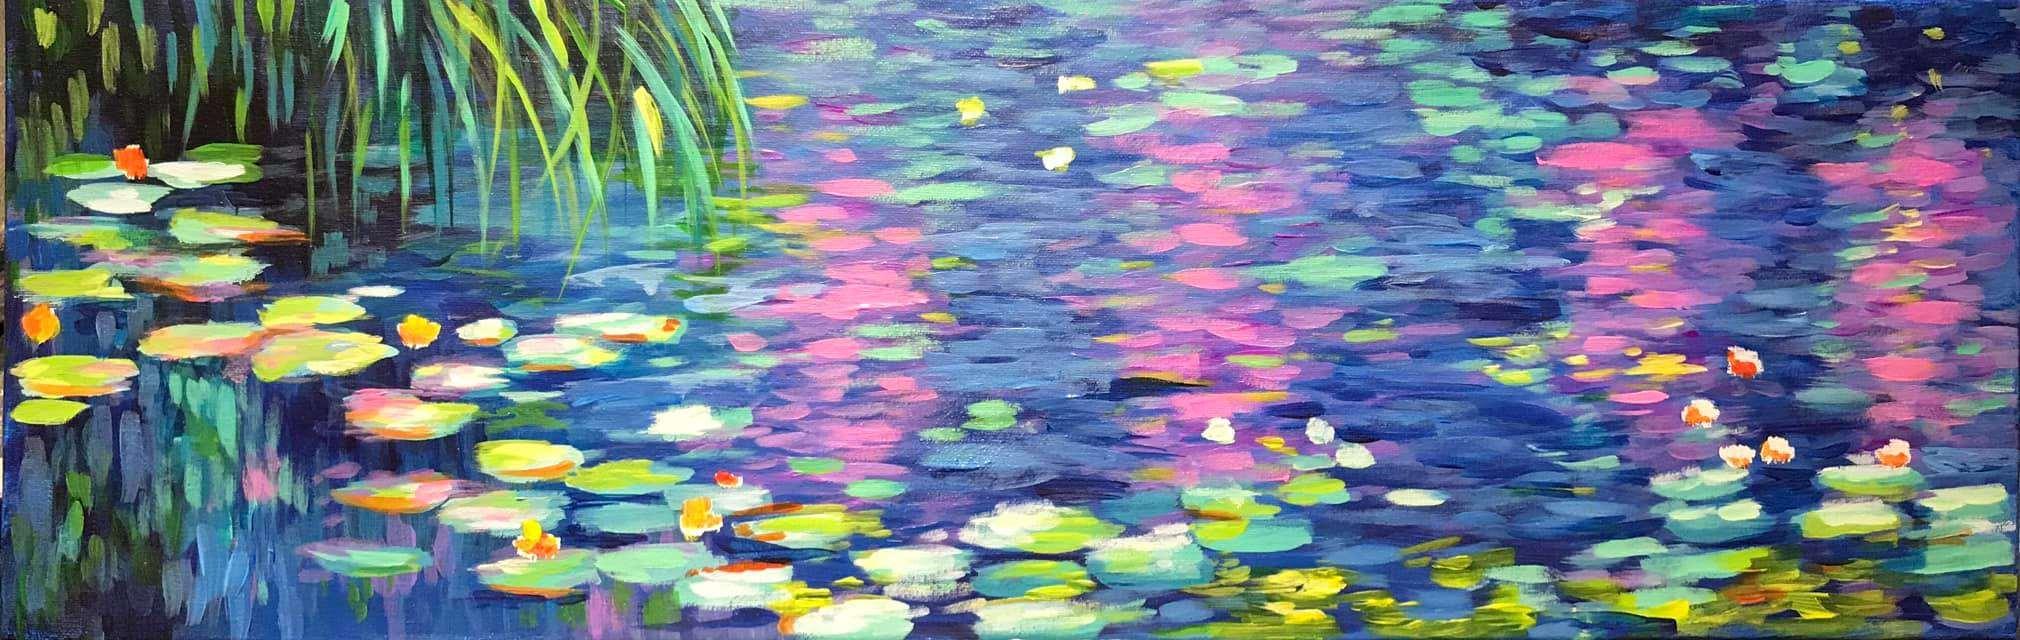 Monet's Water Lillies - April 4